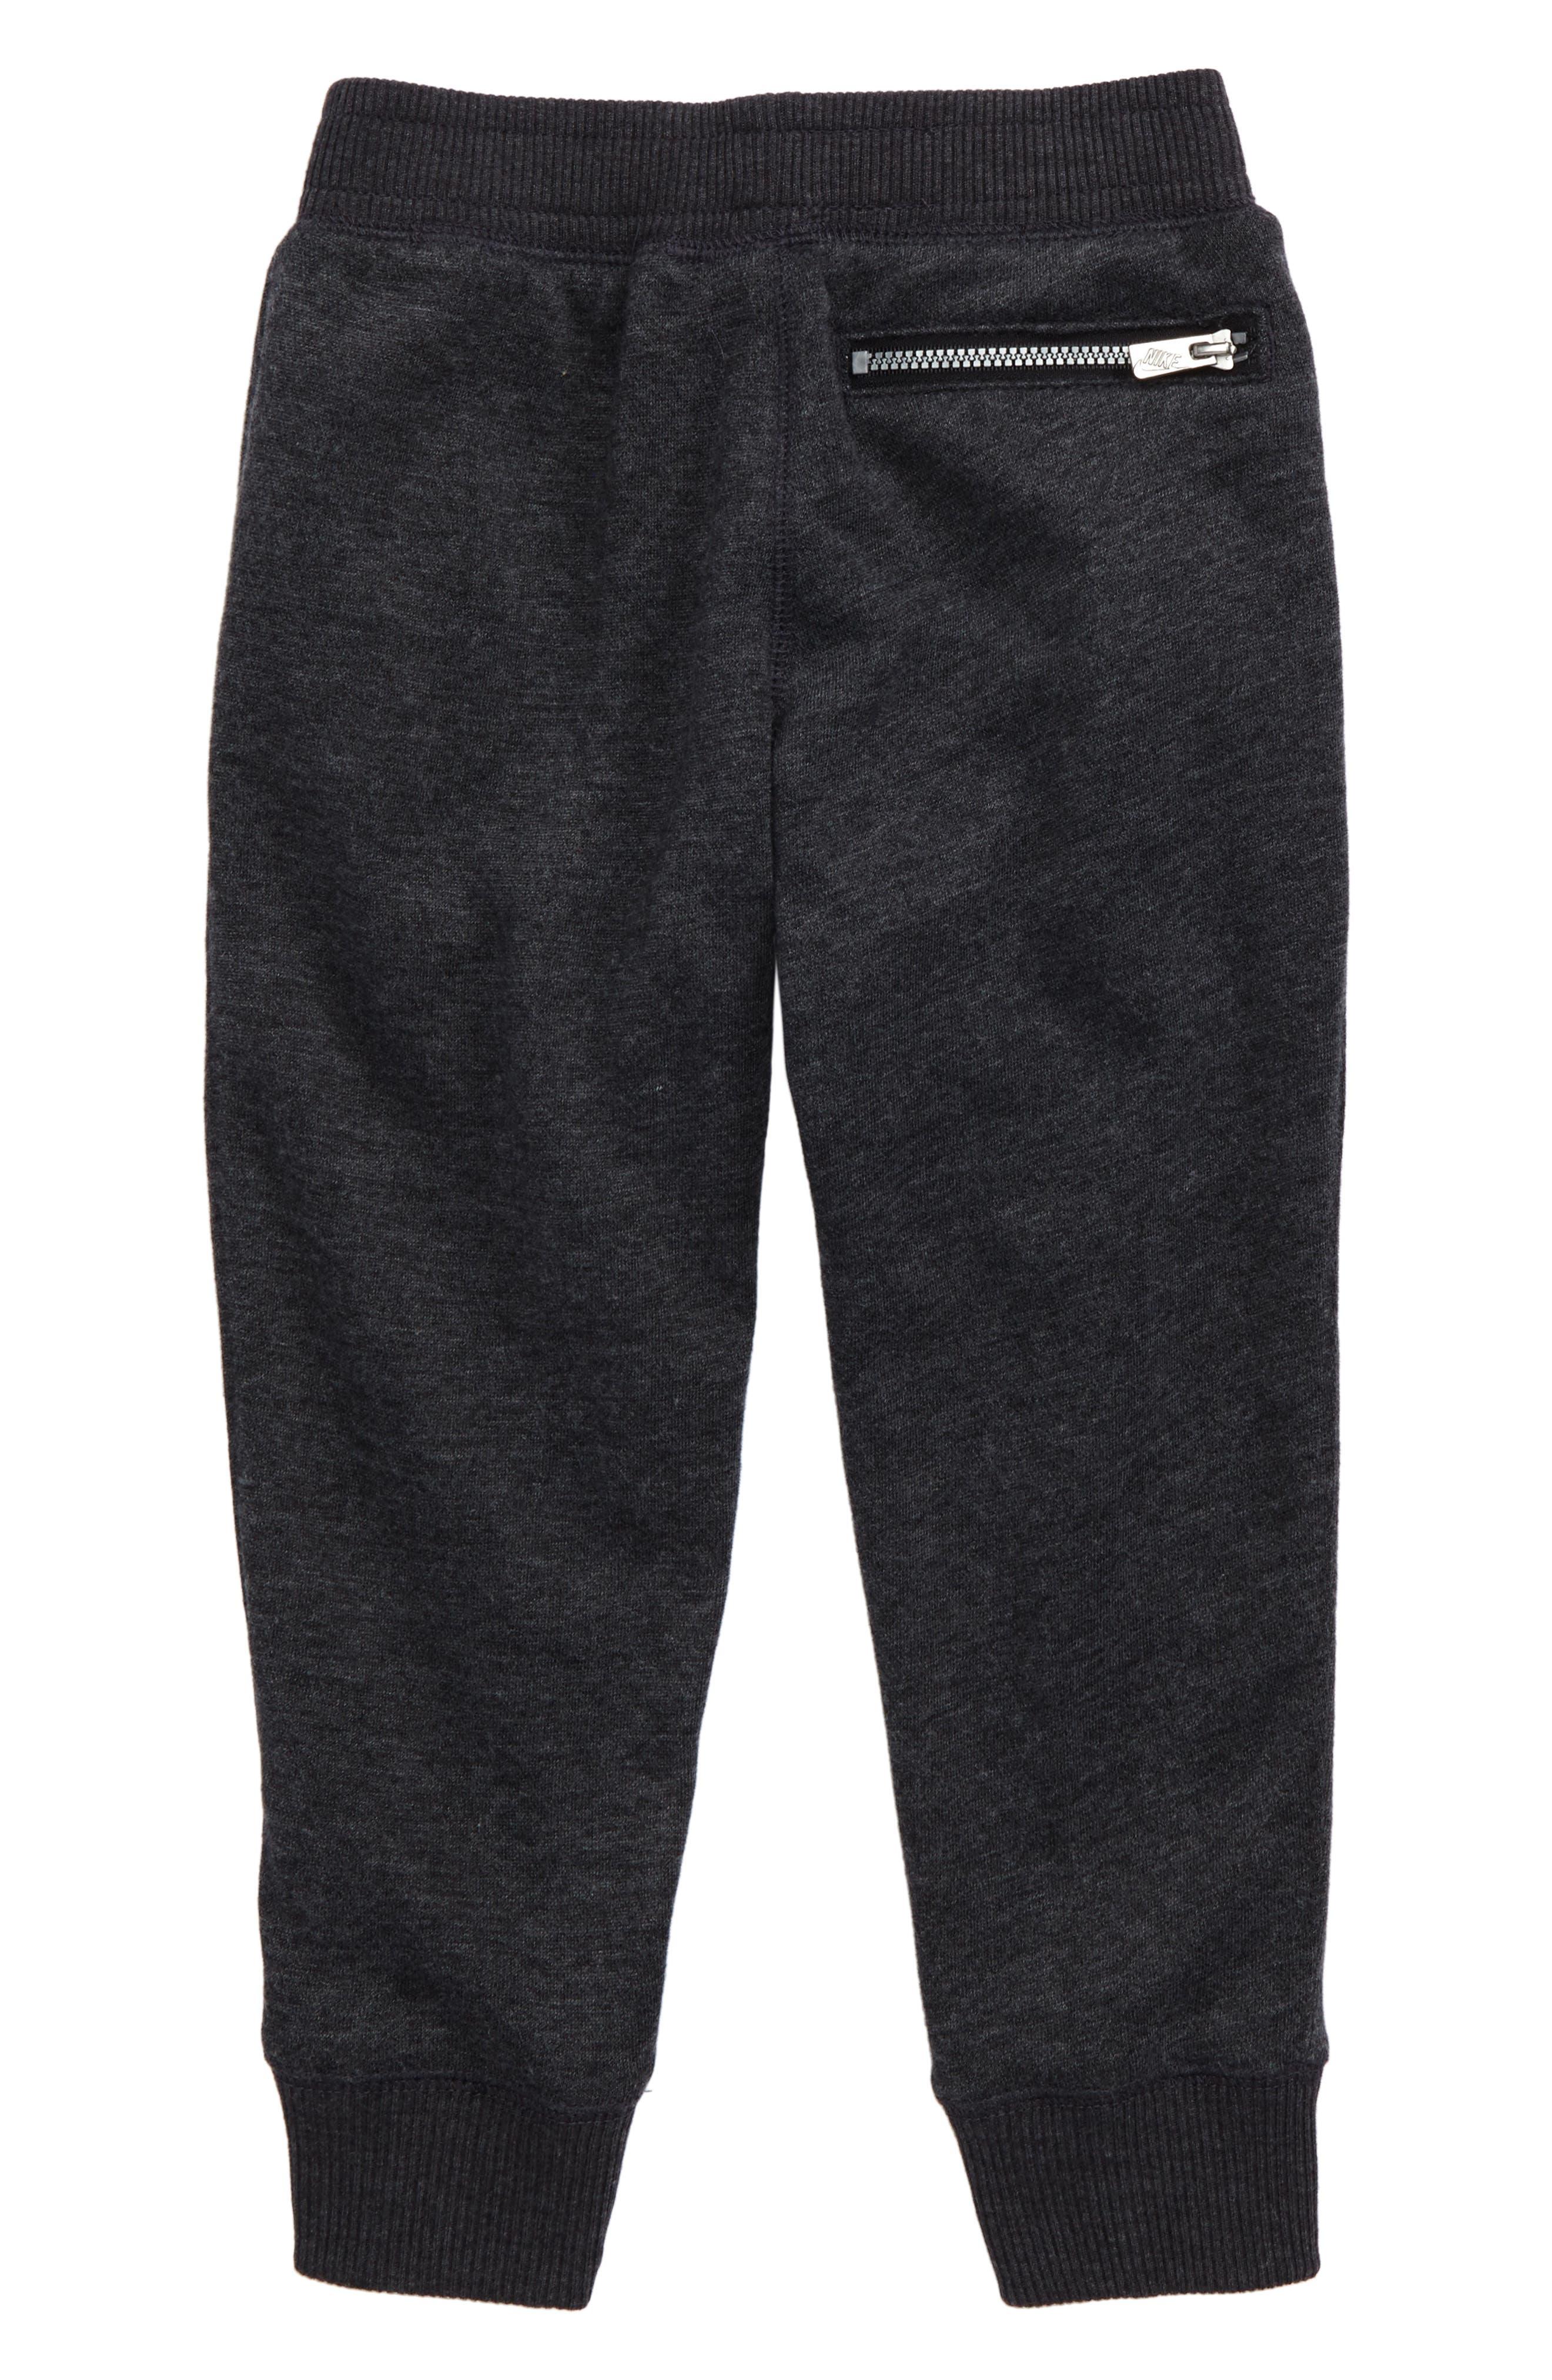 Legacy Jogger Pants,                             Alternate thumbnail 2, color,                             Black Heather